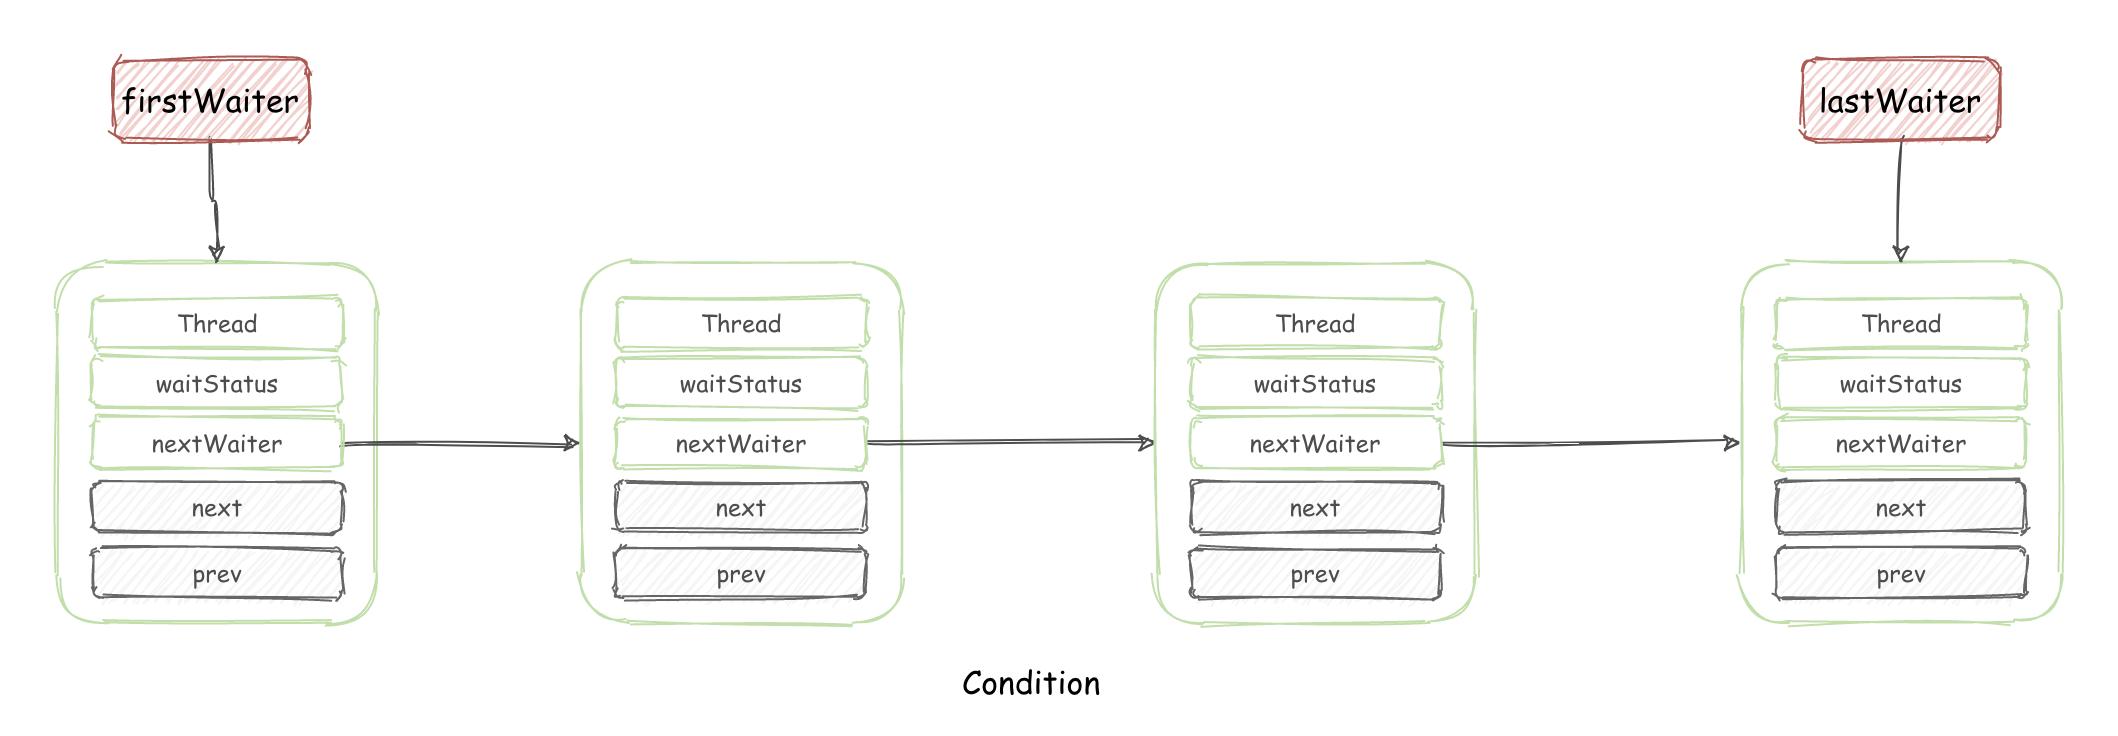 condition-condition-A97bUS